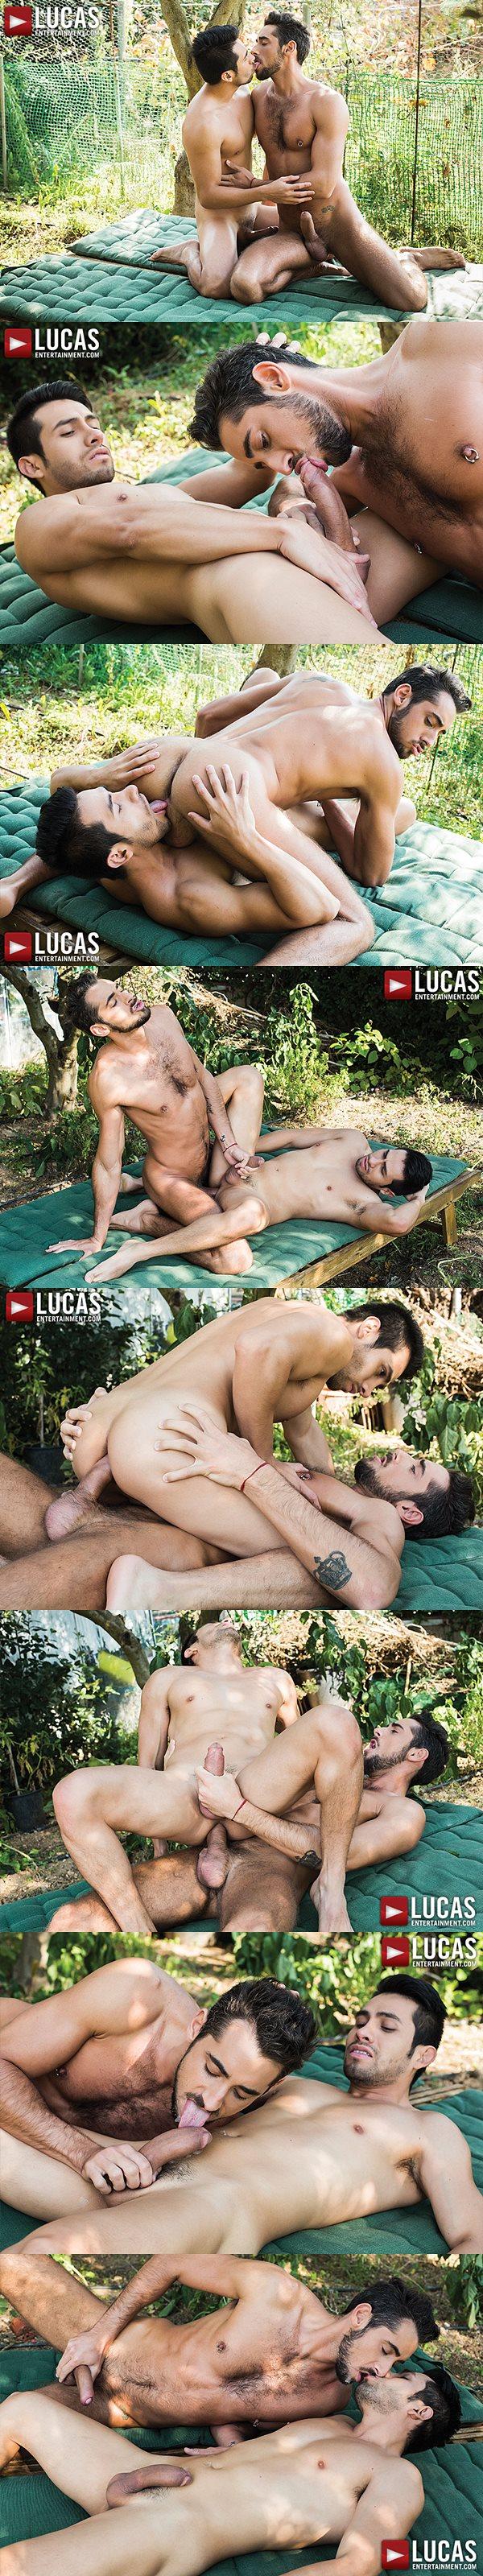 Massimo Piano barebacks and breeds Derek Allan at Lucasentertainment